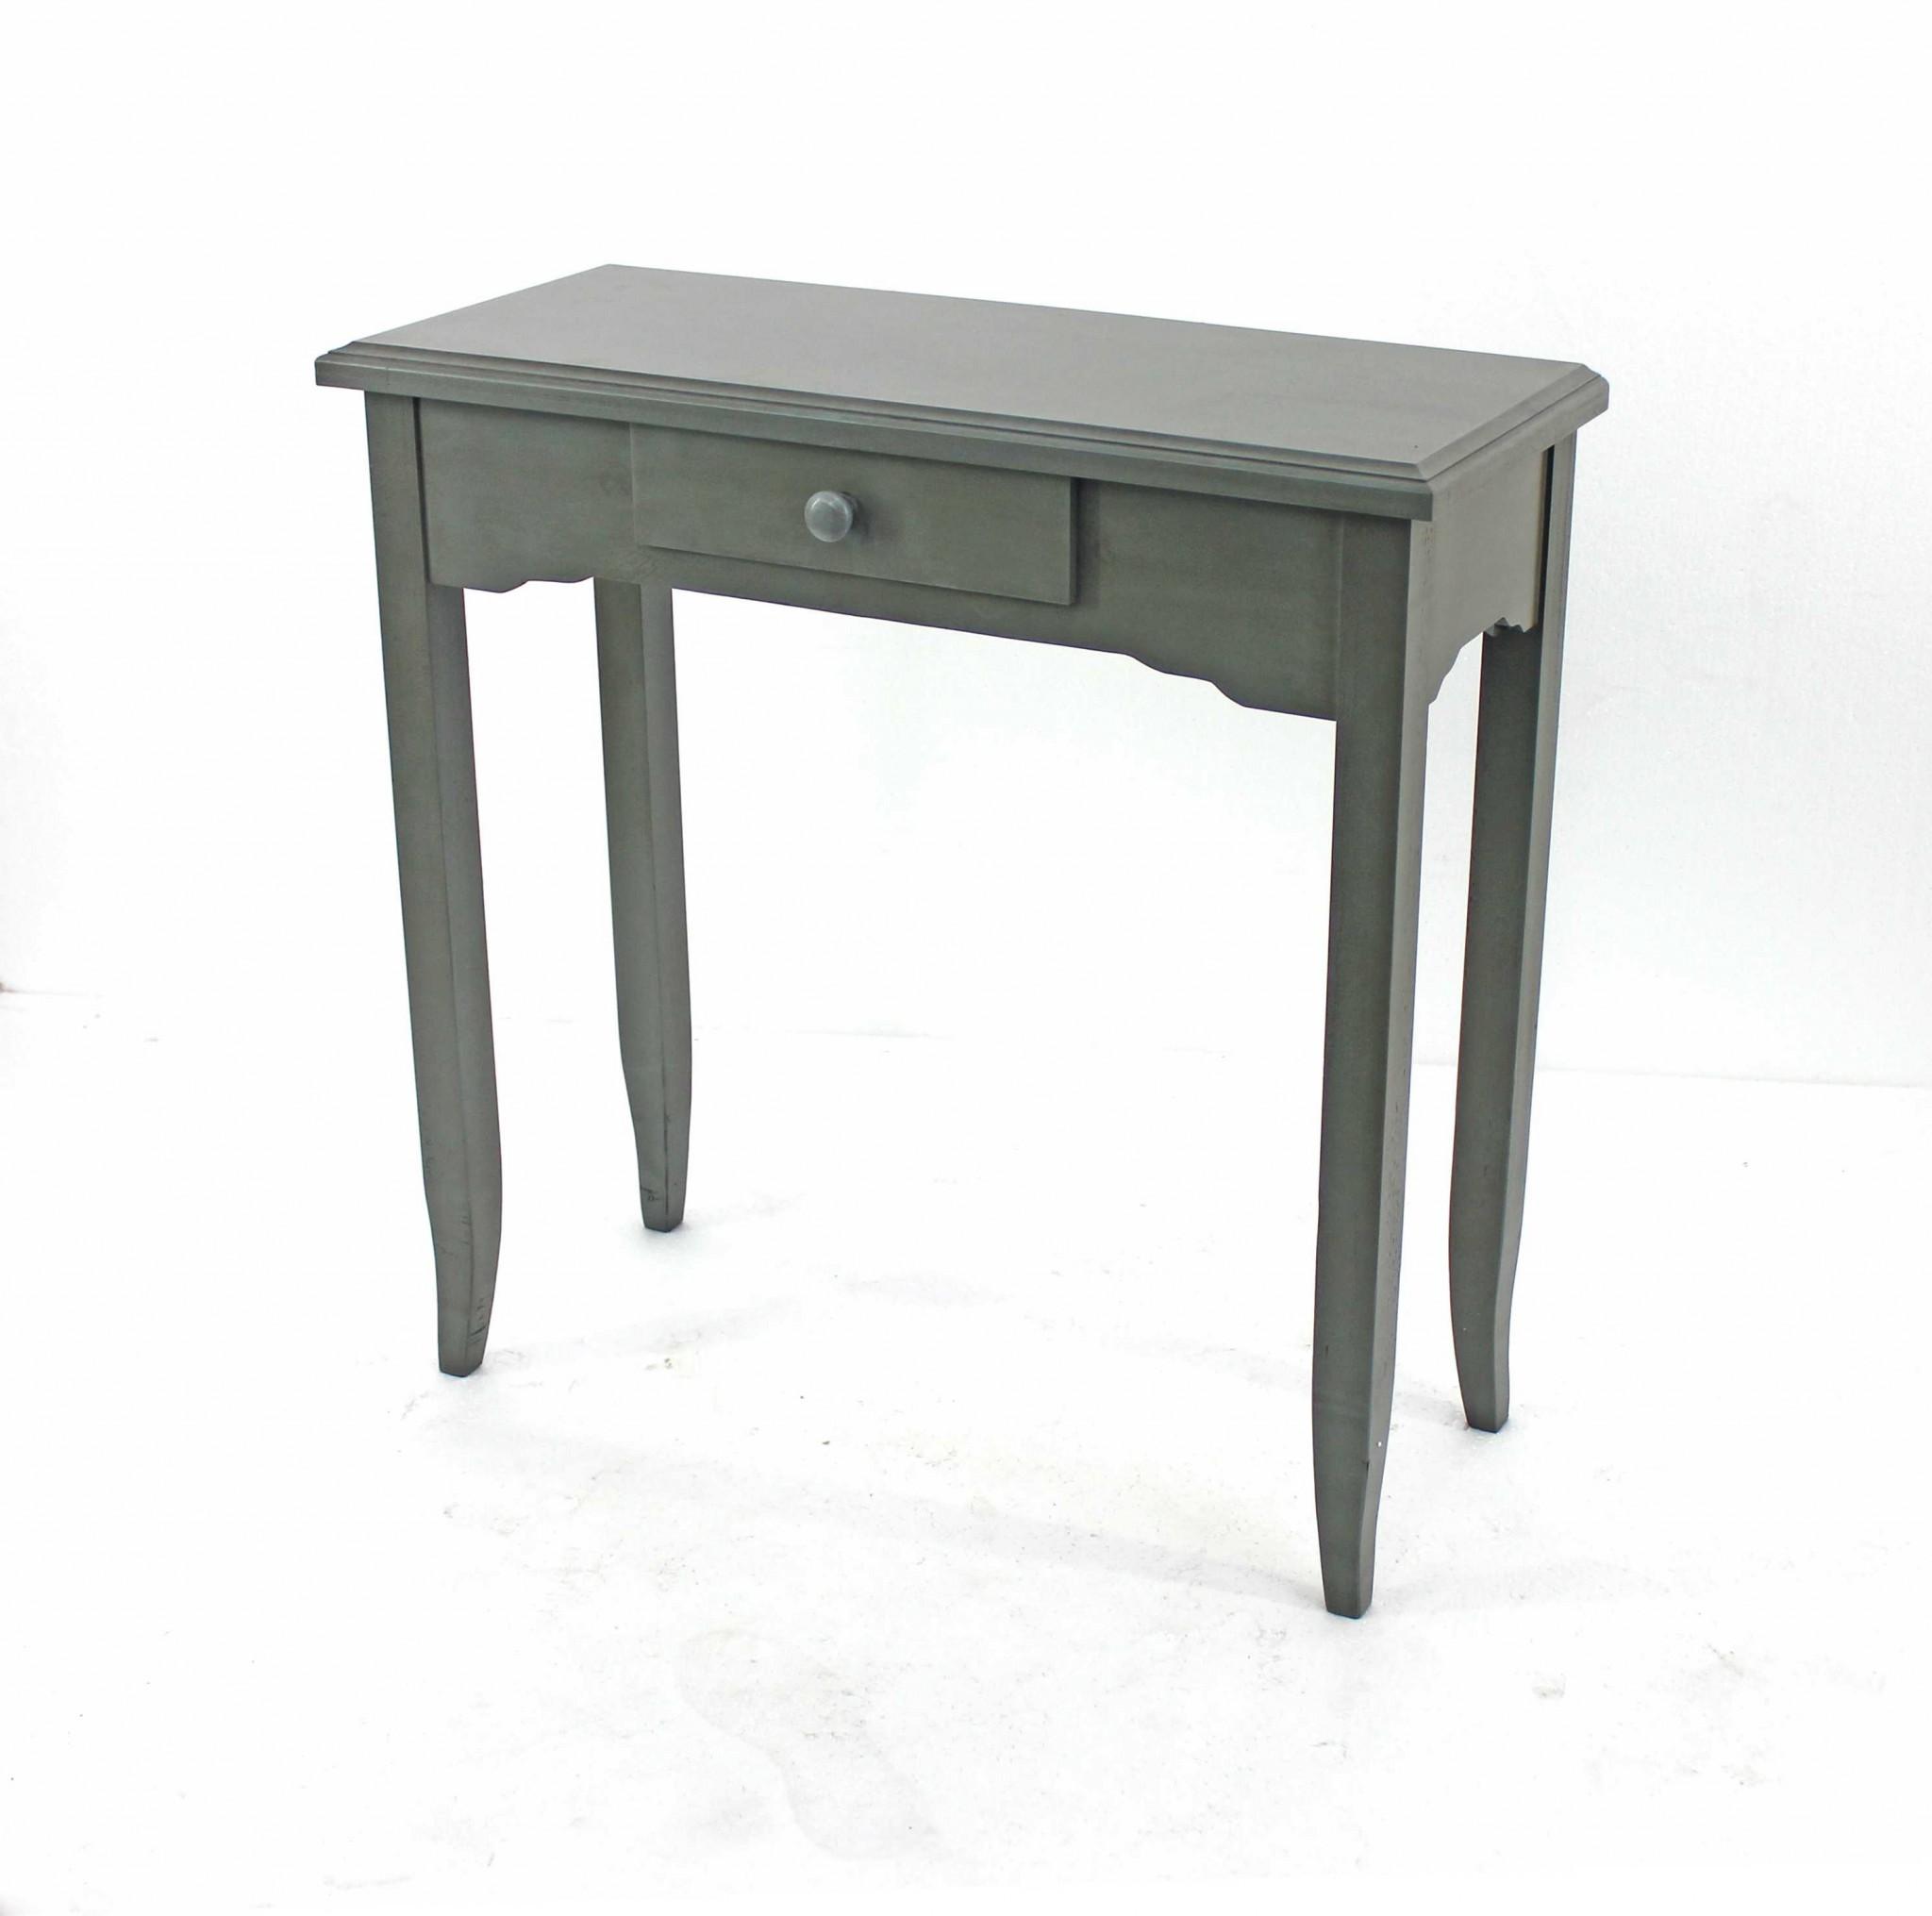 "12"" x 30"" x 30"" Gray, 1 Drawer, Minimalist - Console Table"